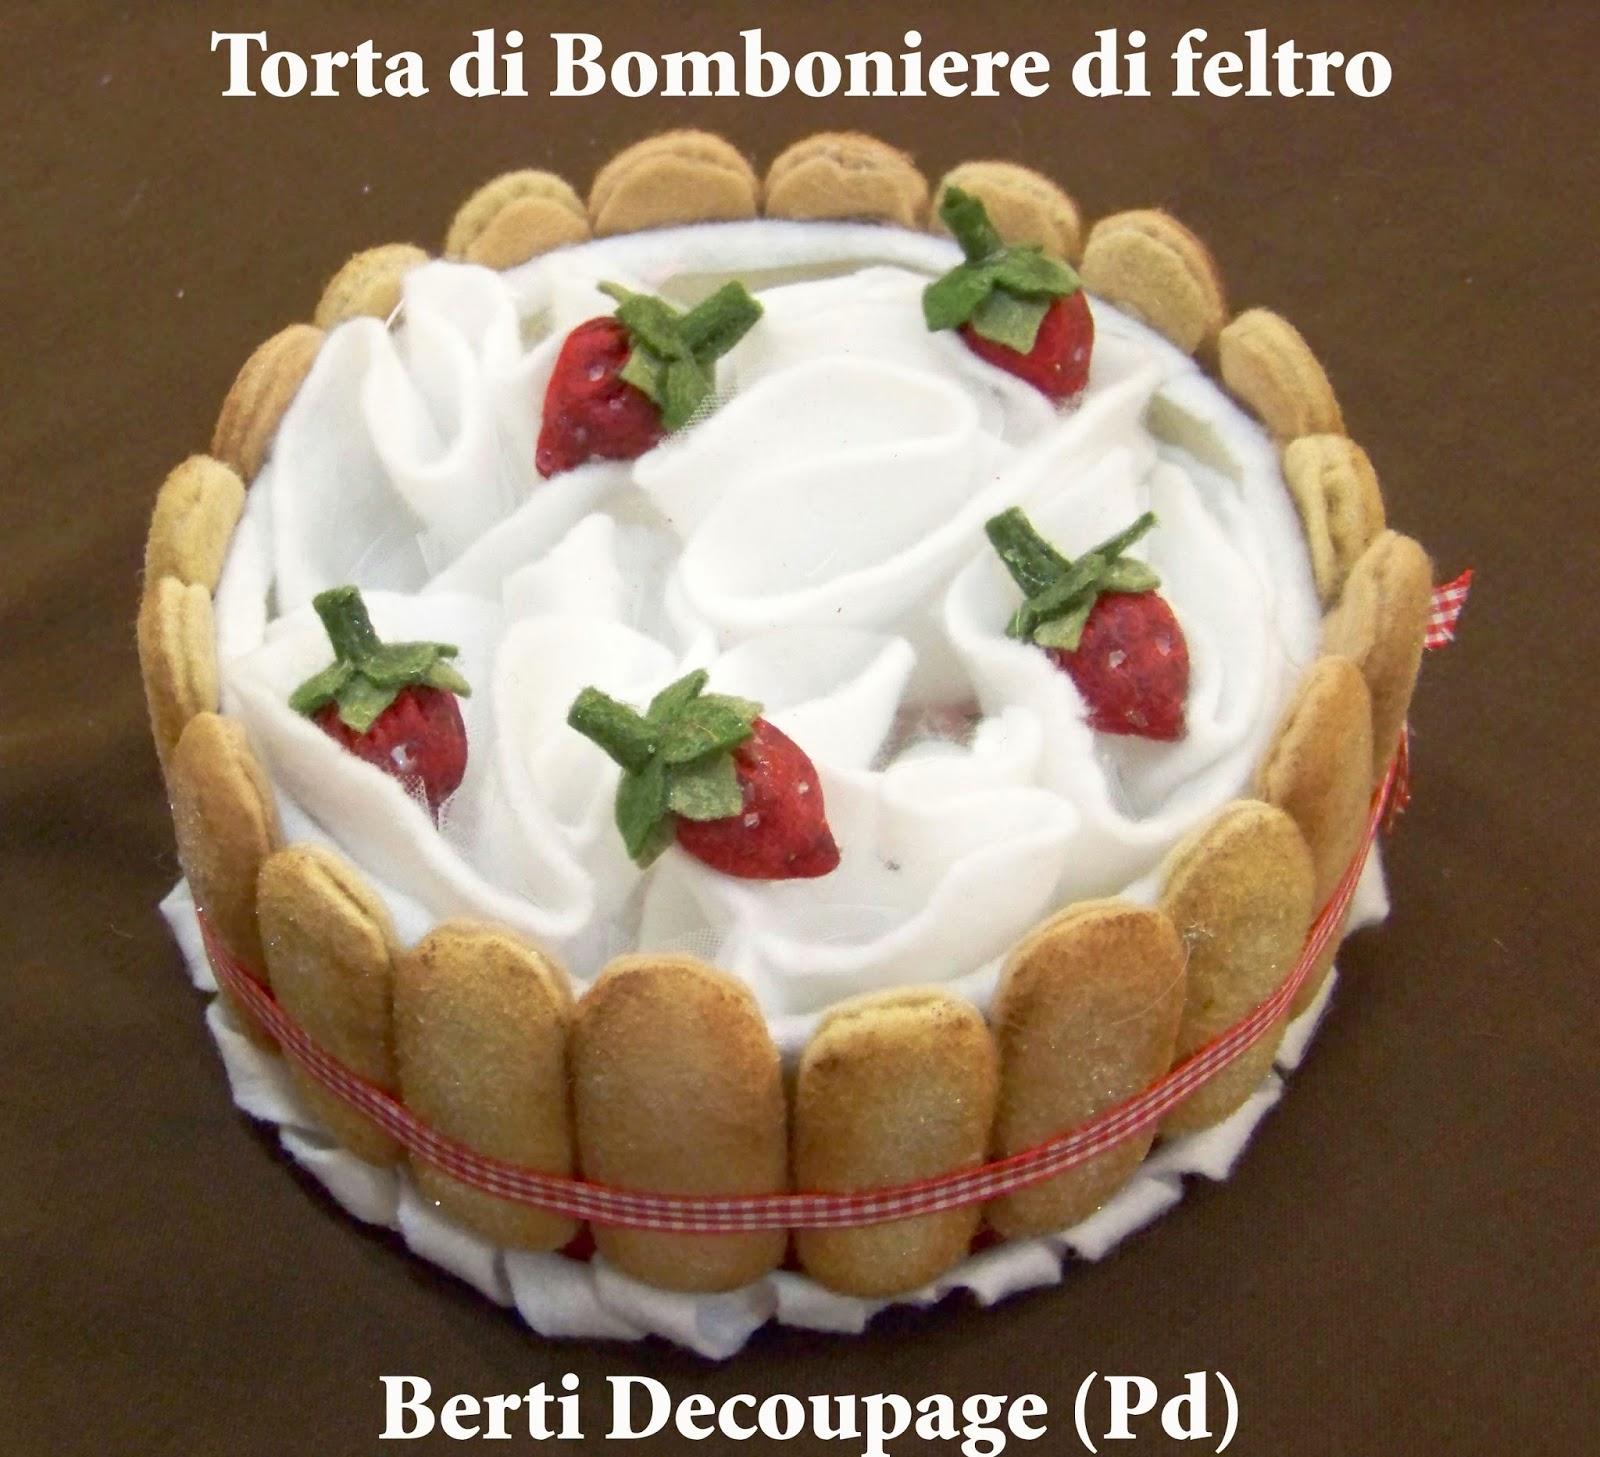 Berti decoupage blog bomboniere fai da te for Berti fai da te